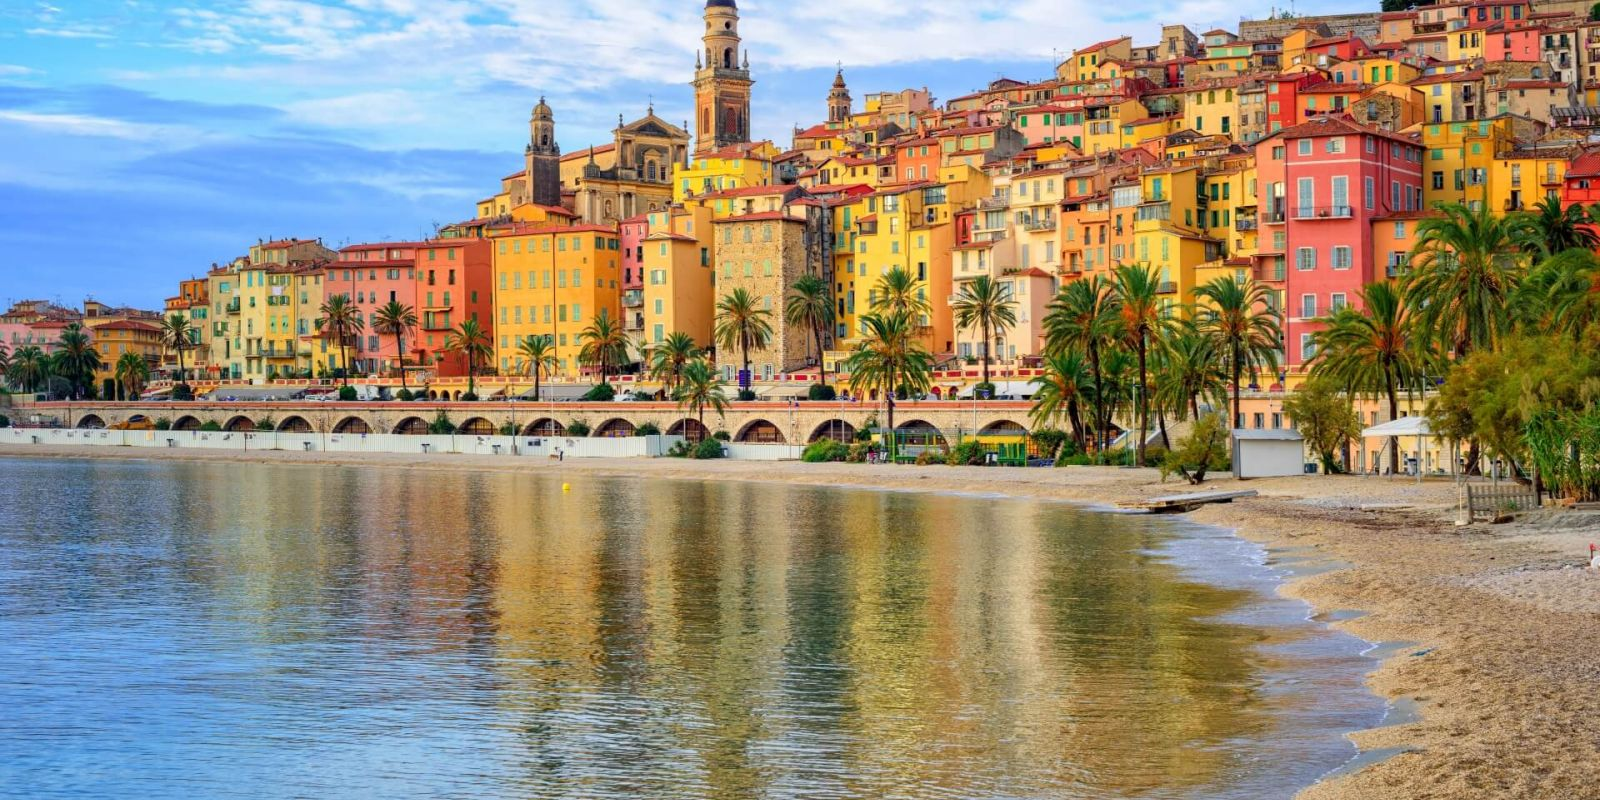 https://www.talamare.com/medias/Yacht charter Menton, yacht rental Menton Riviera dei Fiori